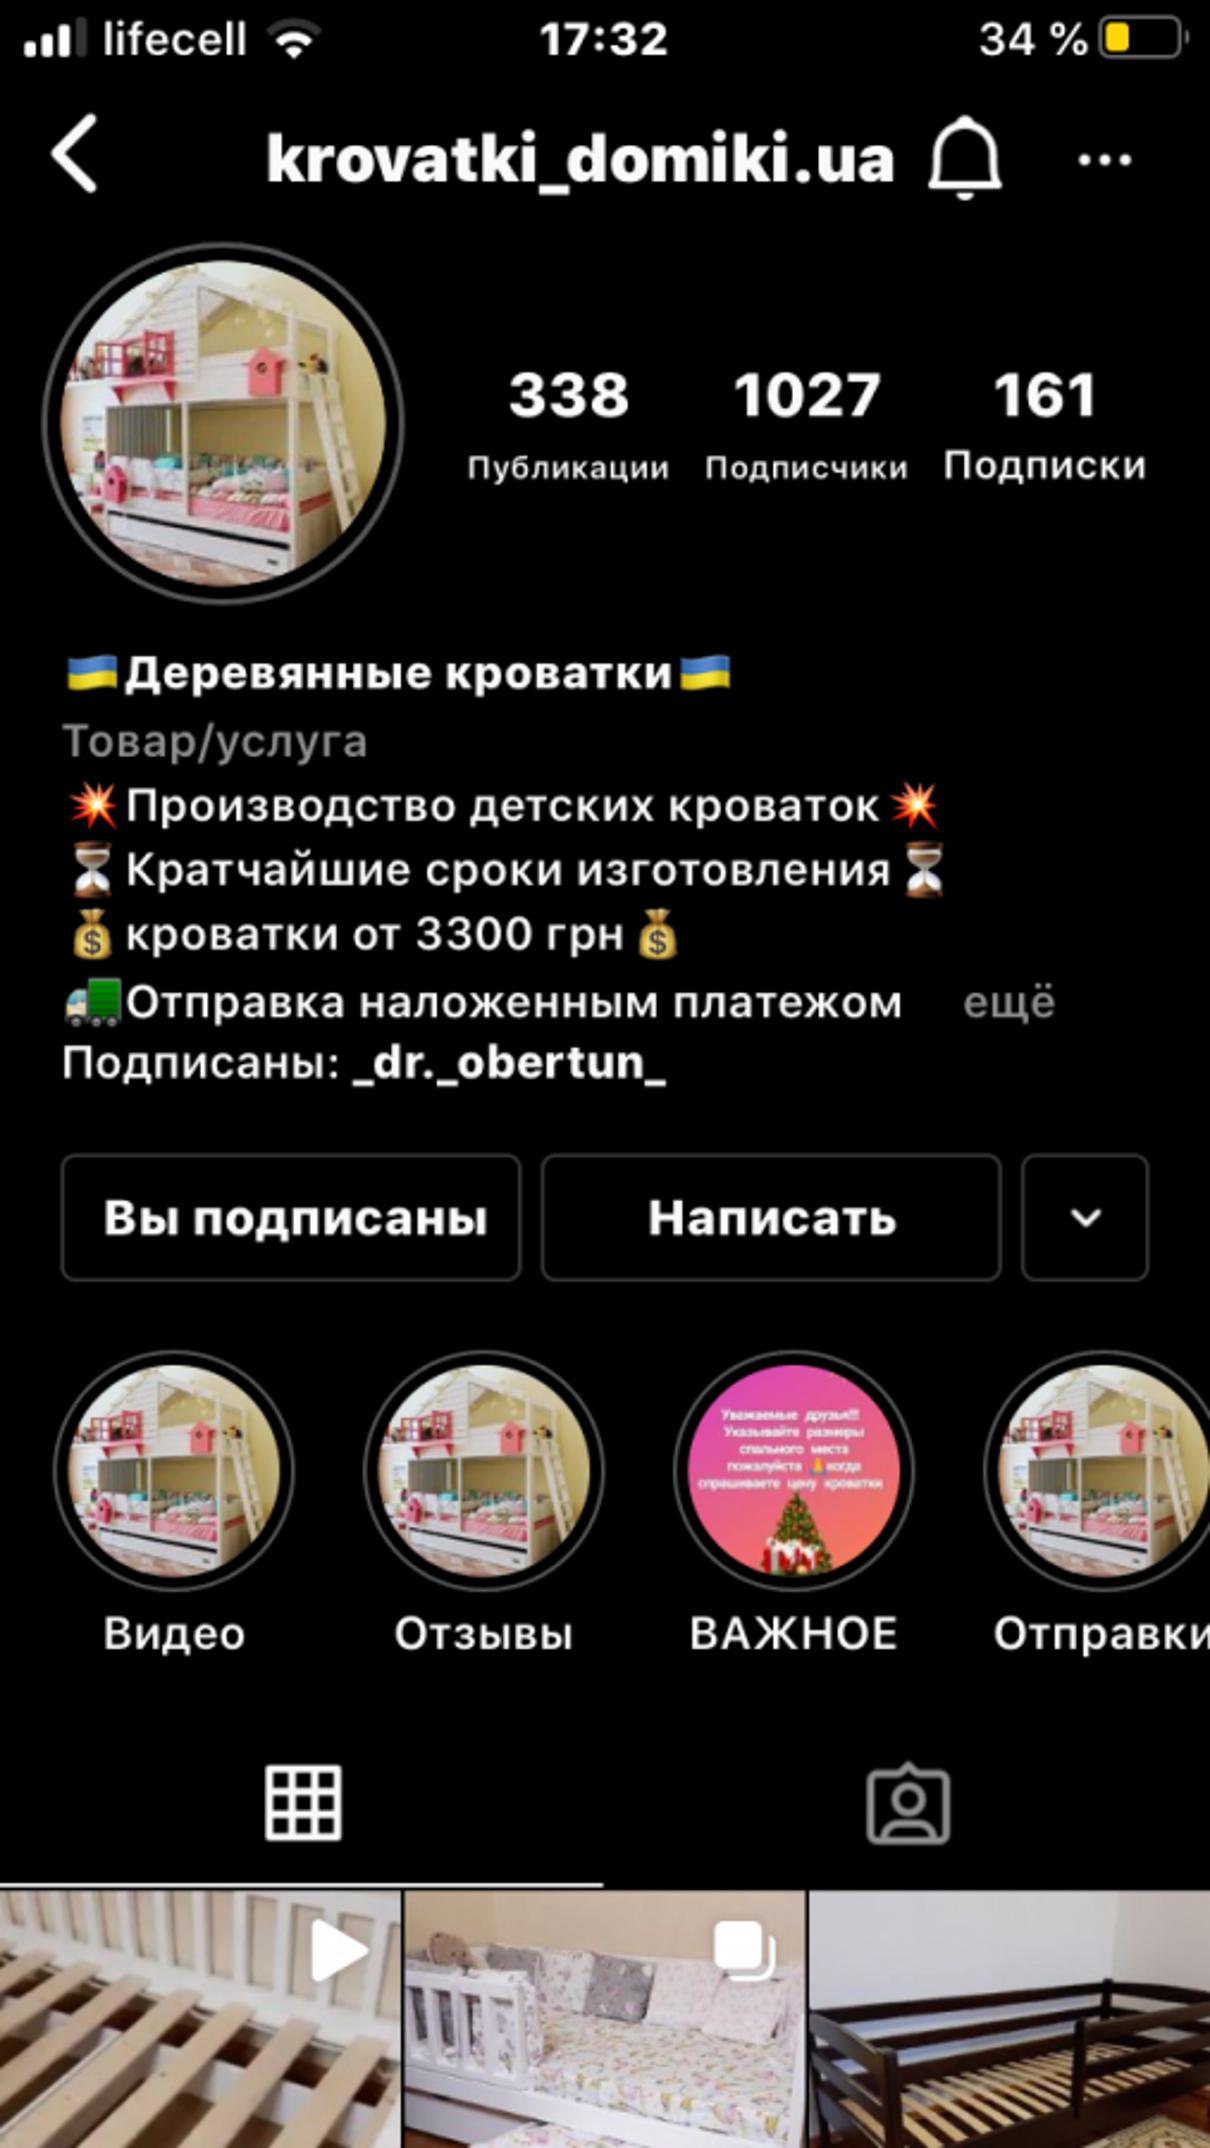 Жалоба-отзыв: Комар Виктория Анатольевна https://instagram.com/krovatki_domiki.ua? igshid=1mt3by0bfnu0h детские кроватки - Комар Виктория Анатольевна